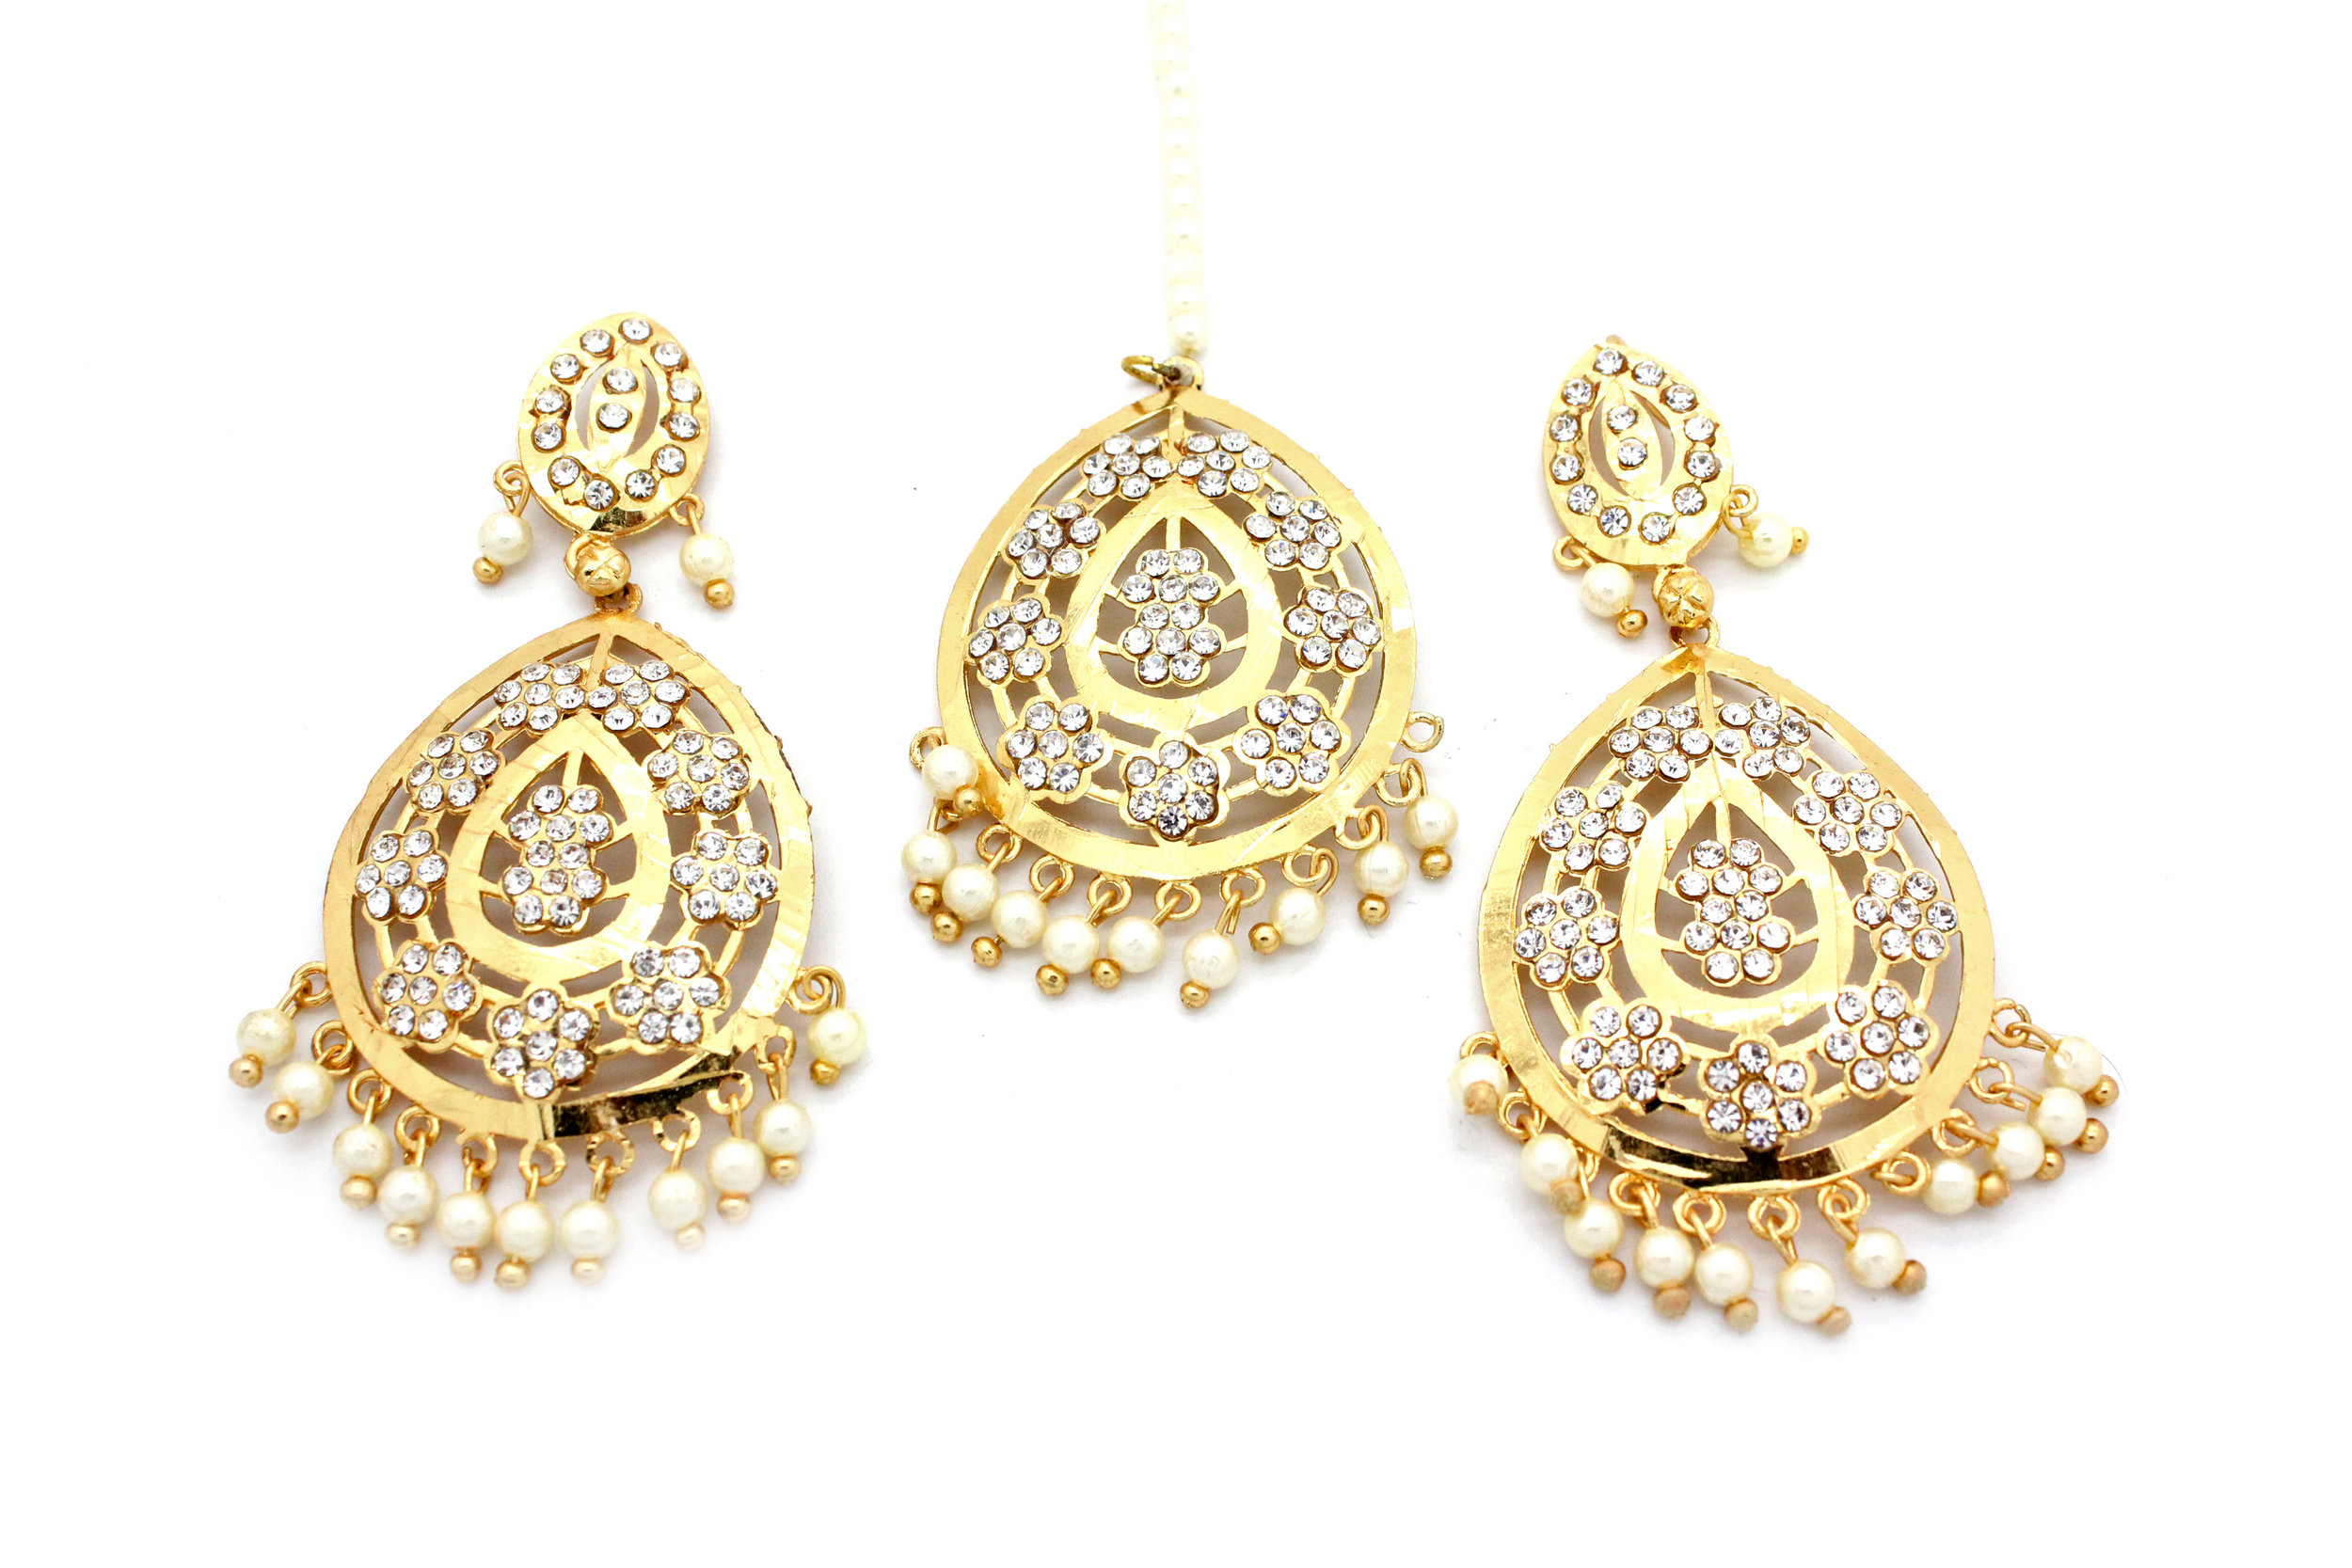 Vintage Indian Tikka & Earring Set